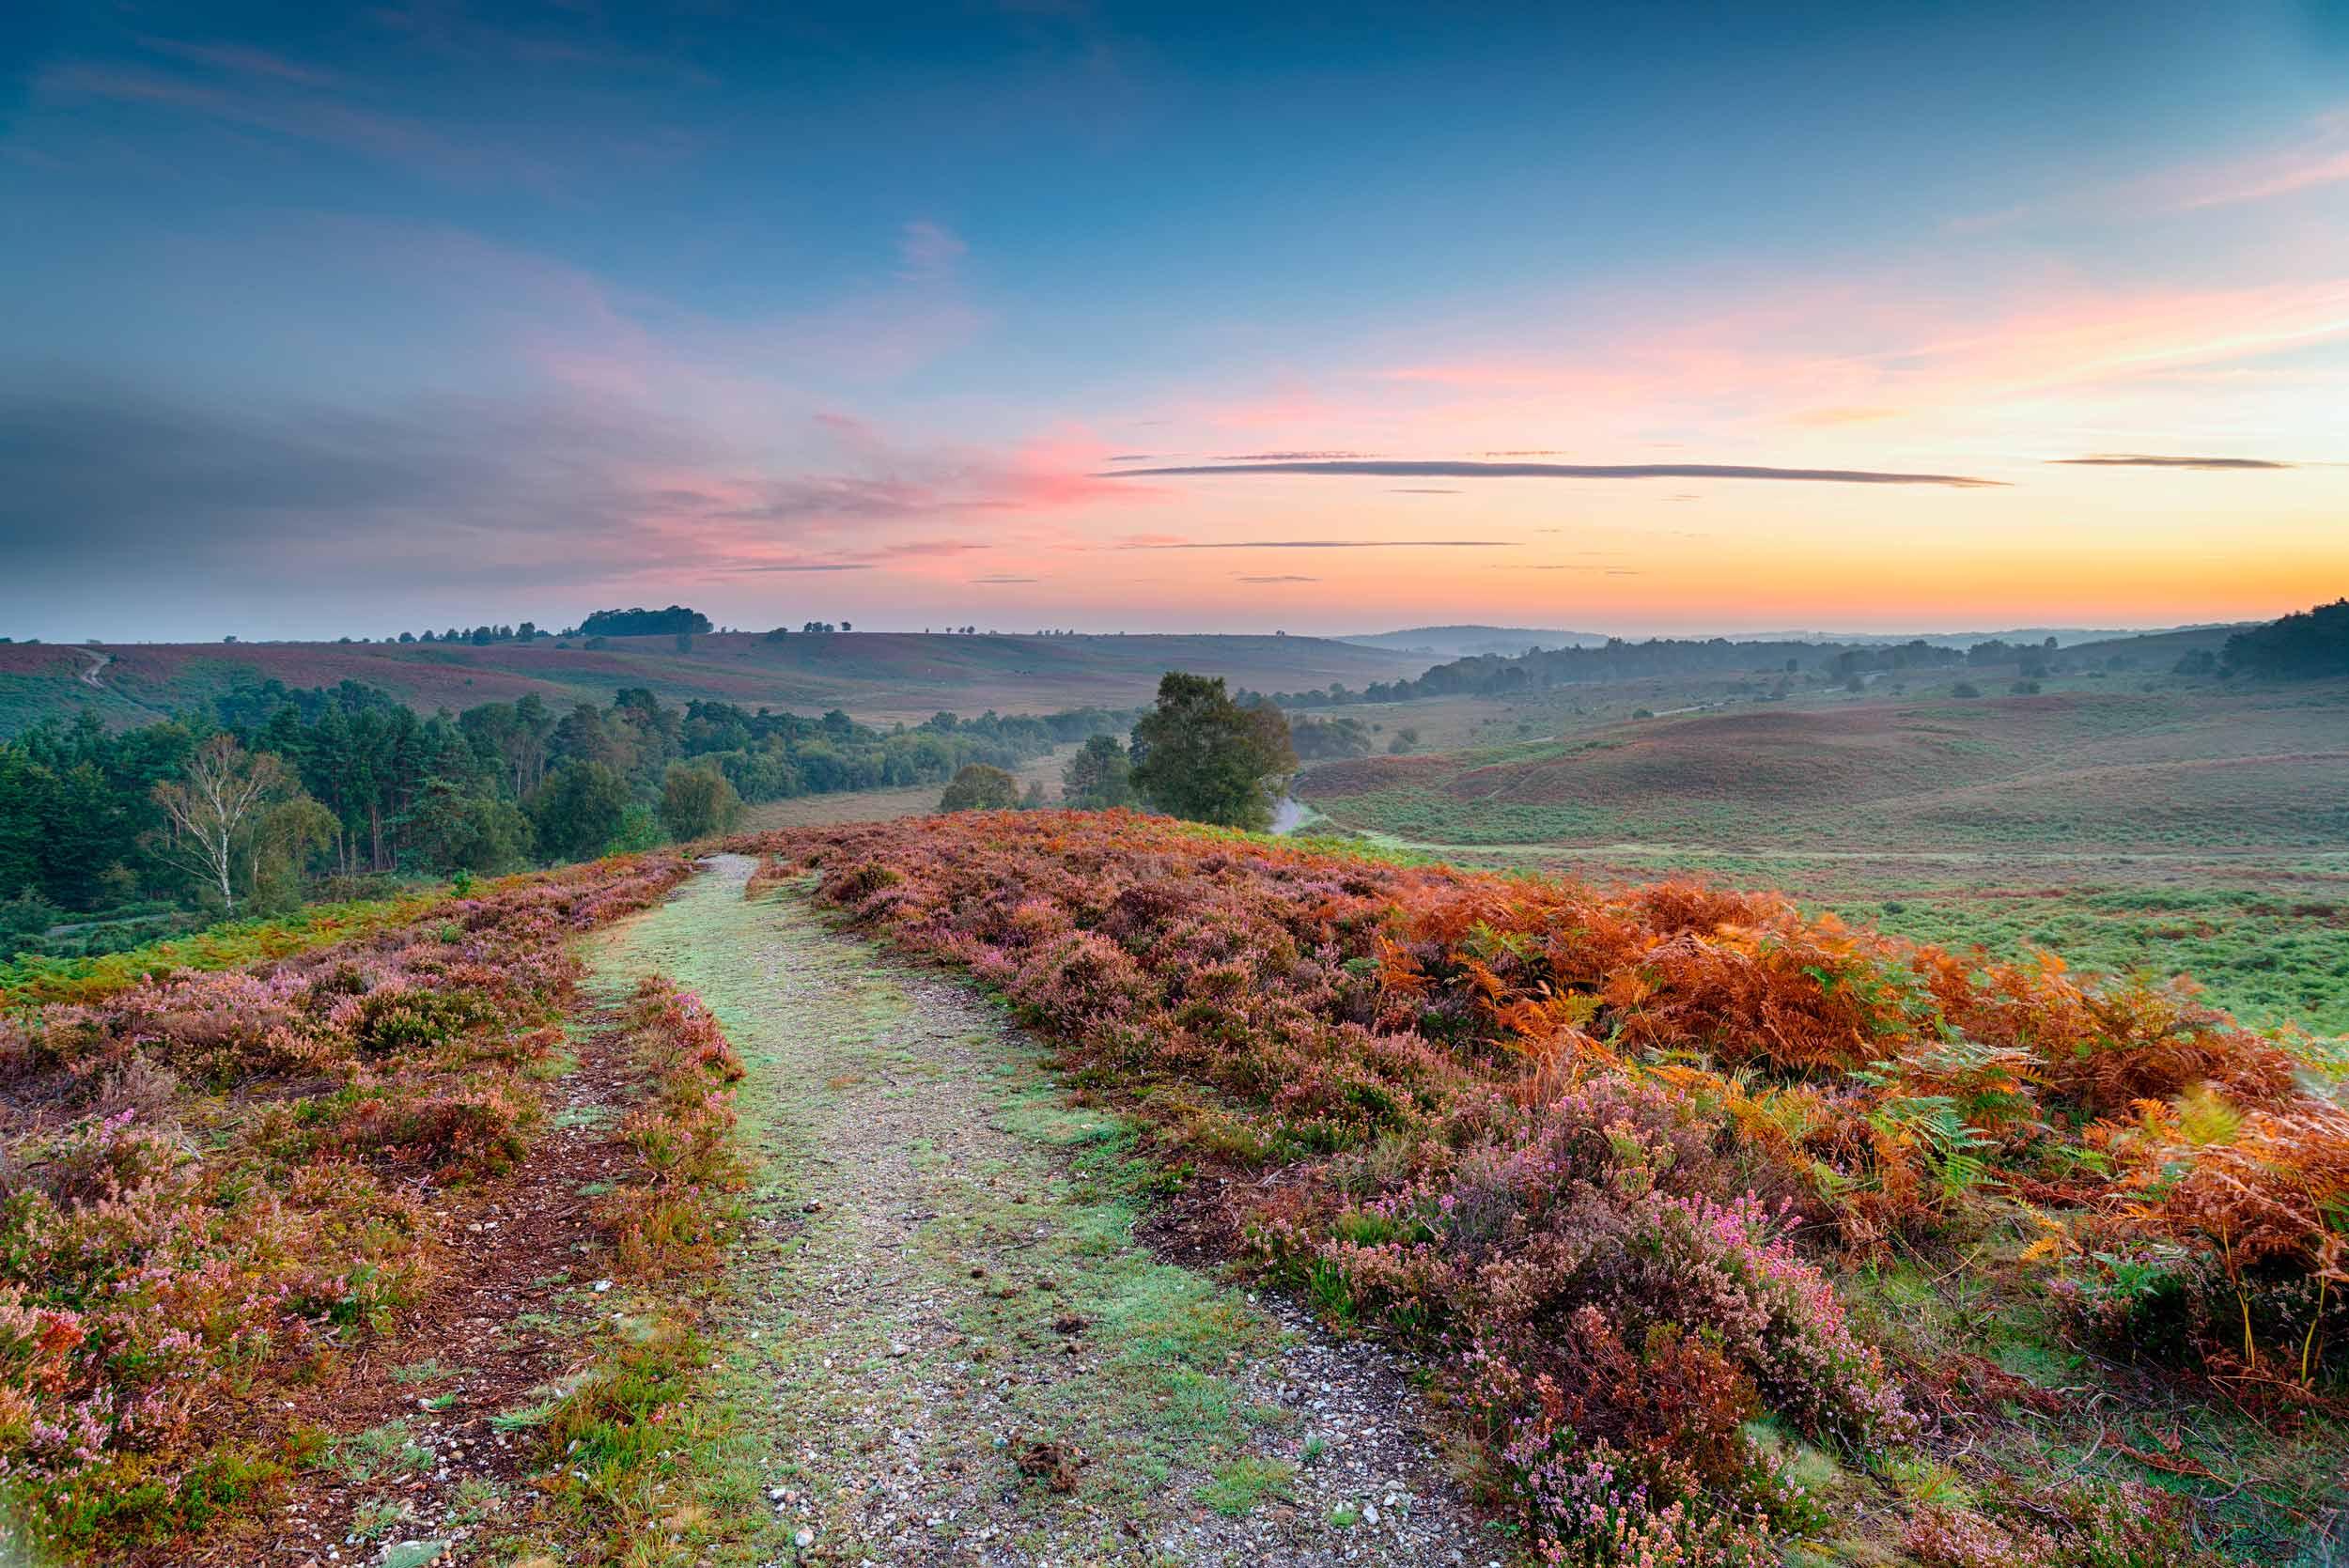 Rockford Common, New Forest, England  (Helen Hotson/Shutterstock)